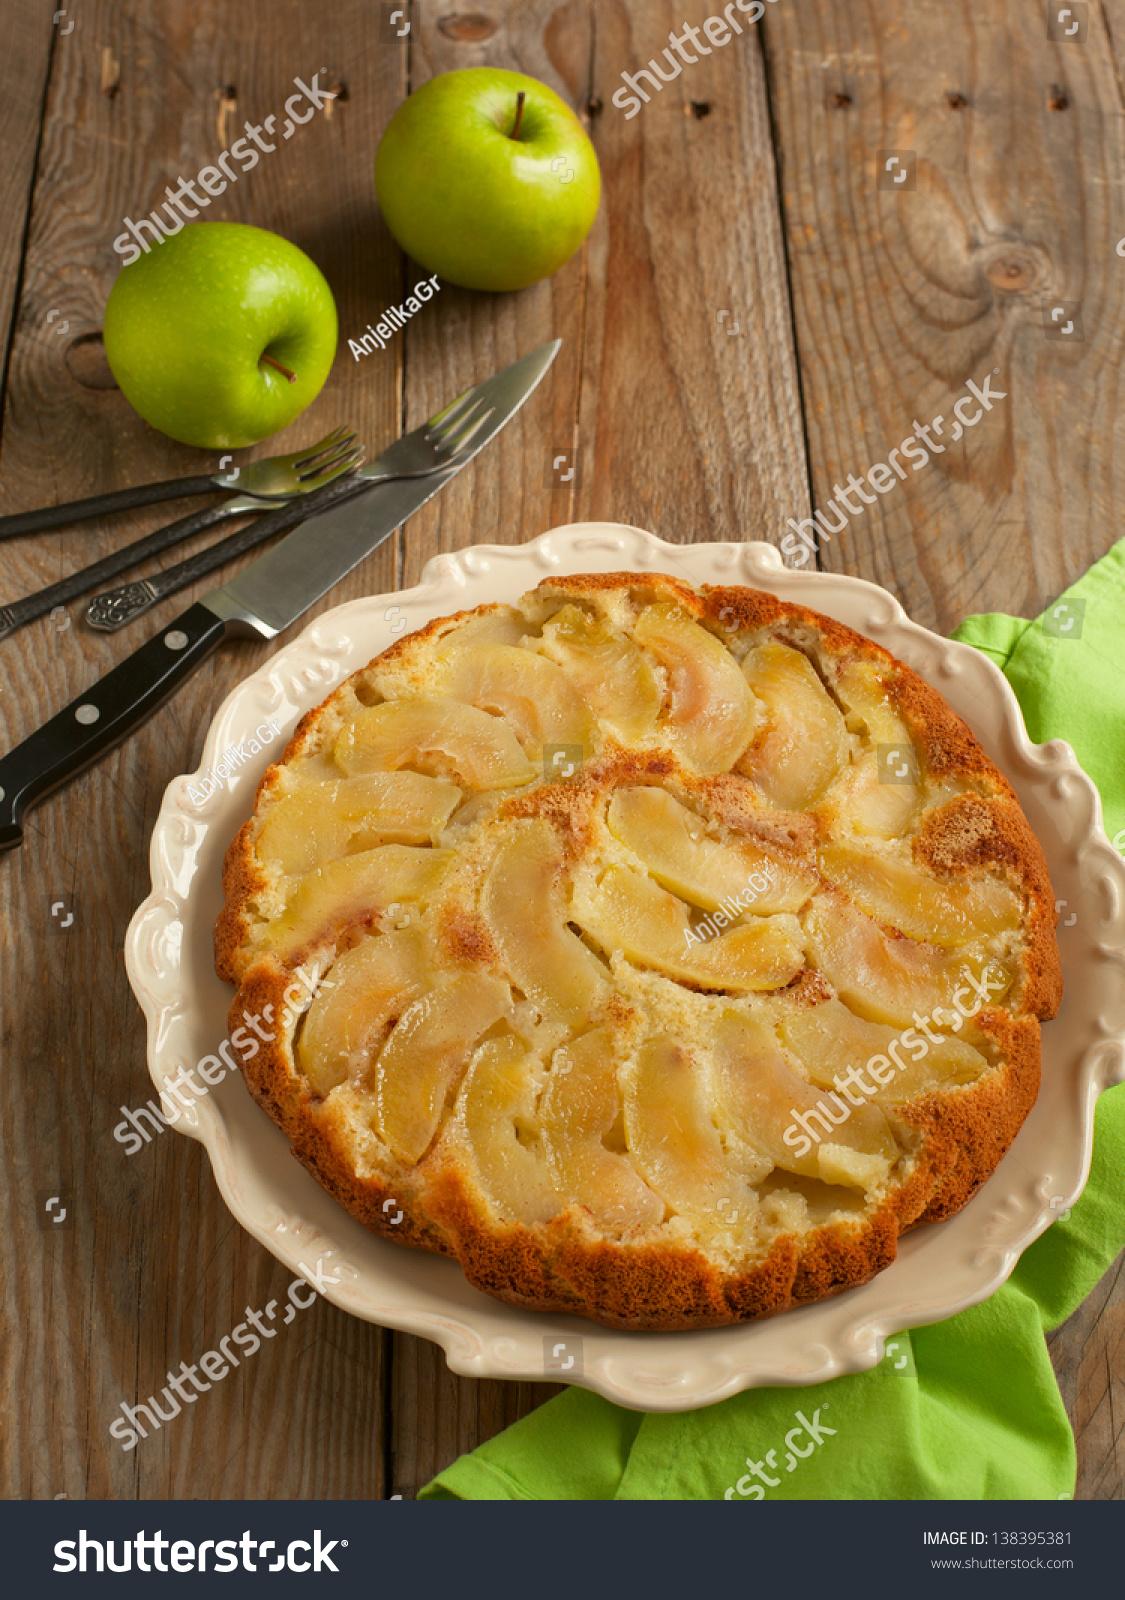 Upside Down Apple Cake Tasty